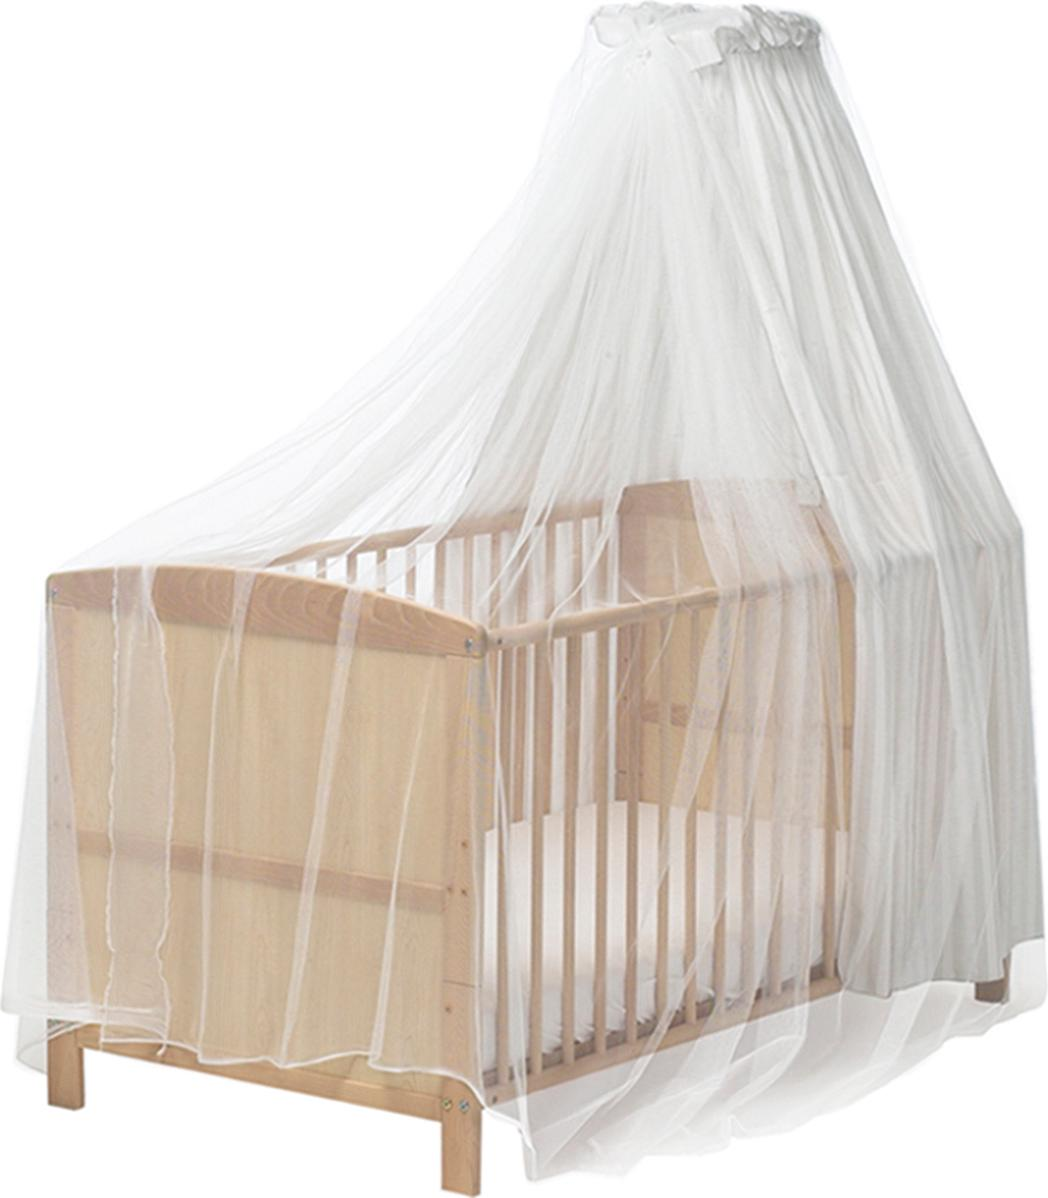 Full Size of Kinderbett Poco Playshoes 601003 Insektenschutz Schlafzimmer Komplett Betten Big Sofa Küche Bett 140x200 Wohnzimmer Kinderbett Poco